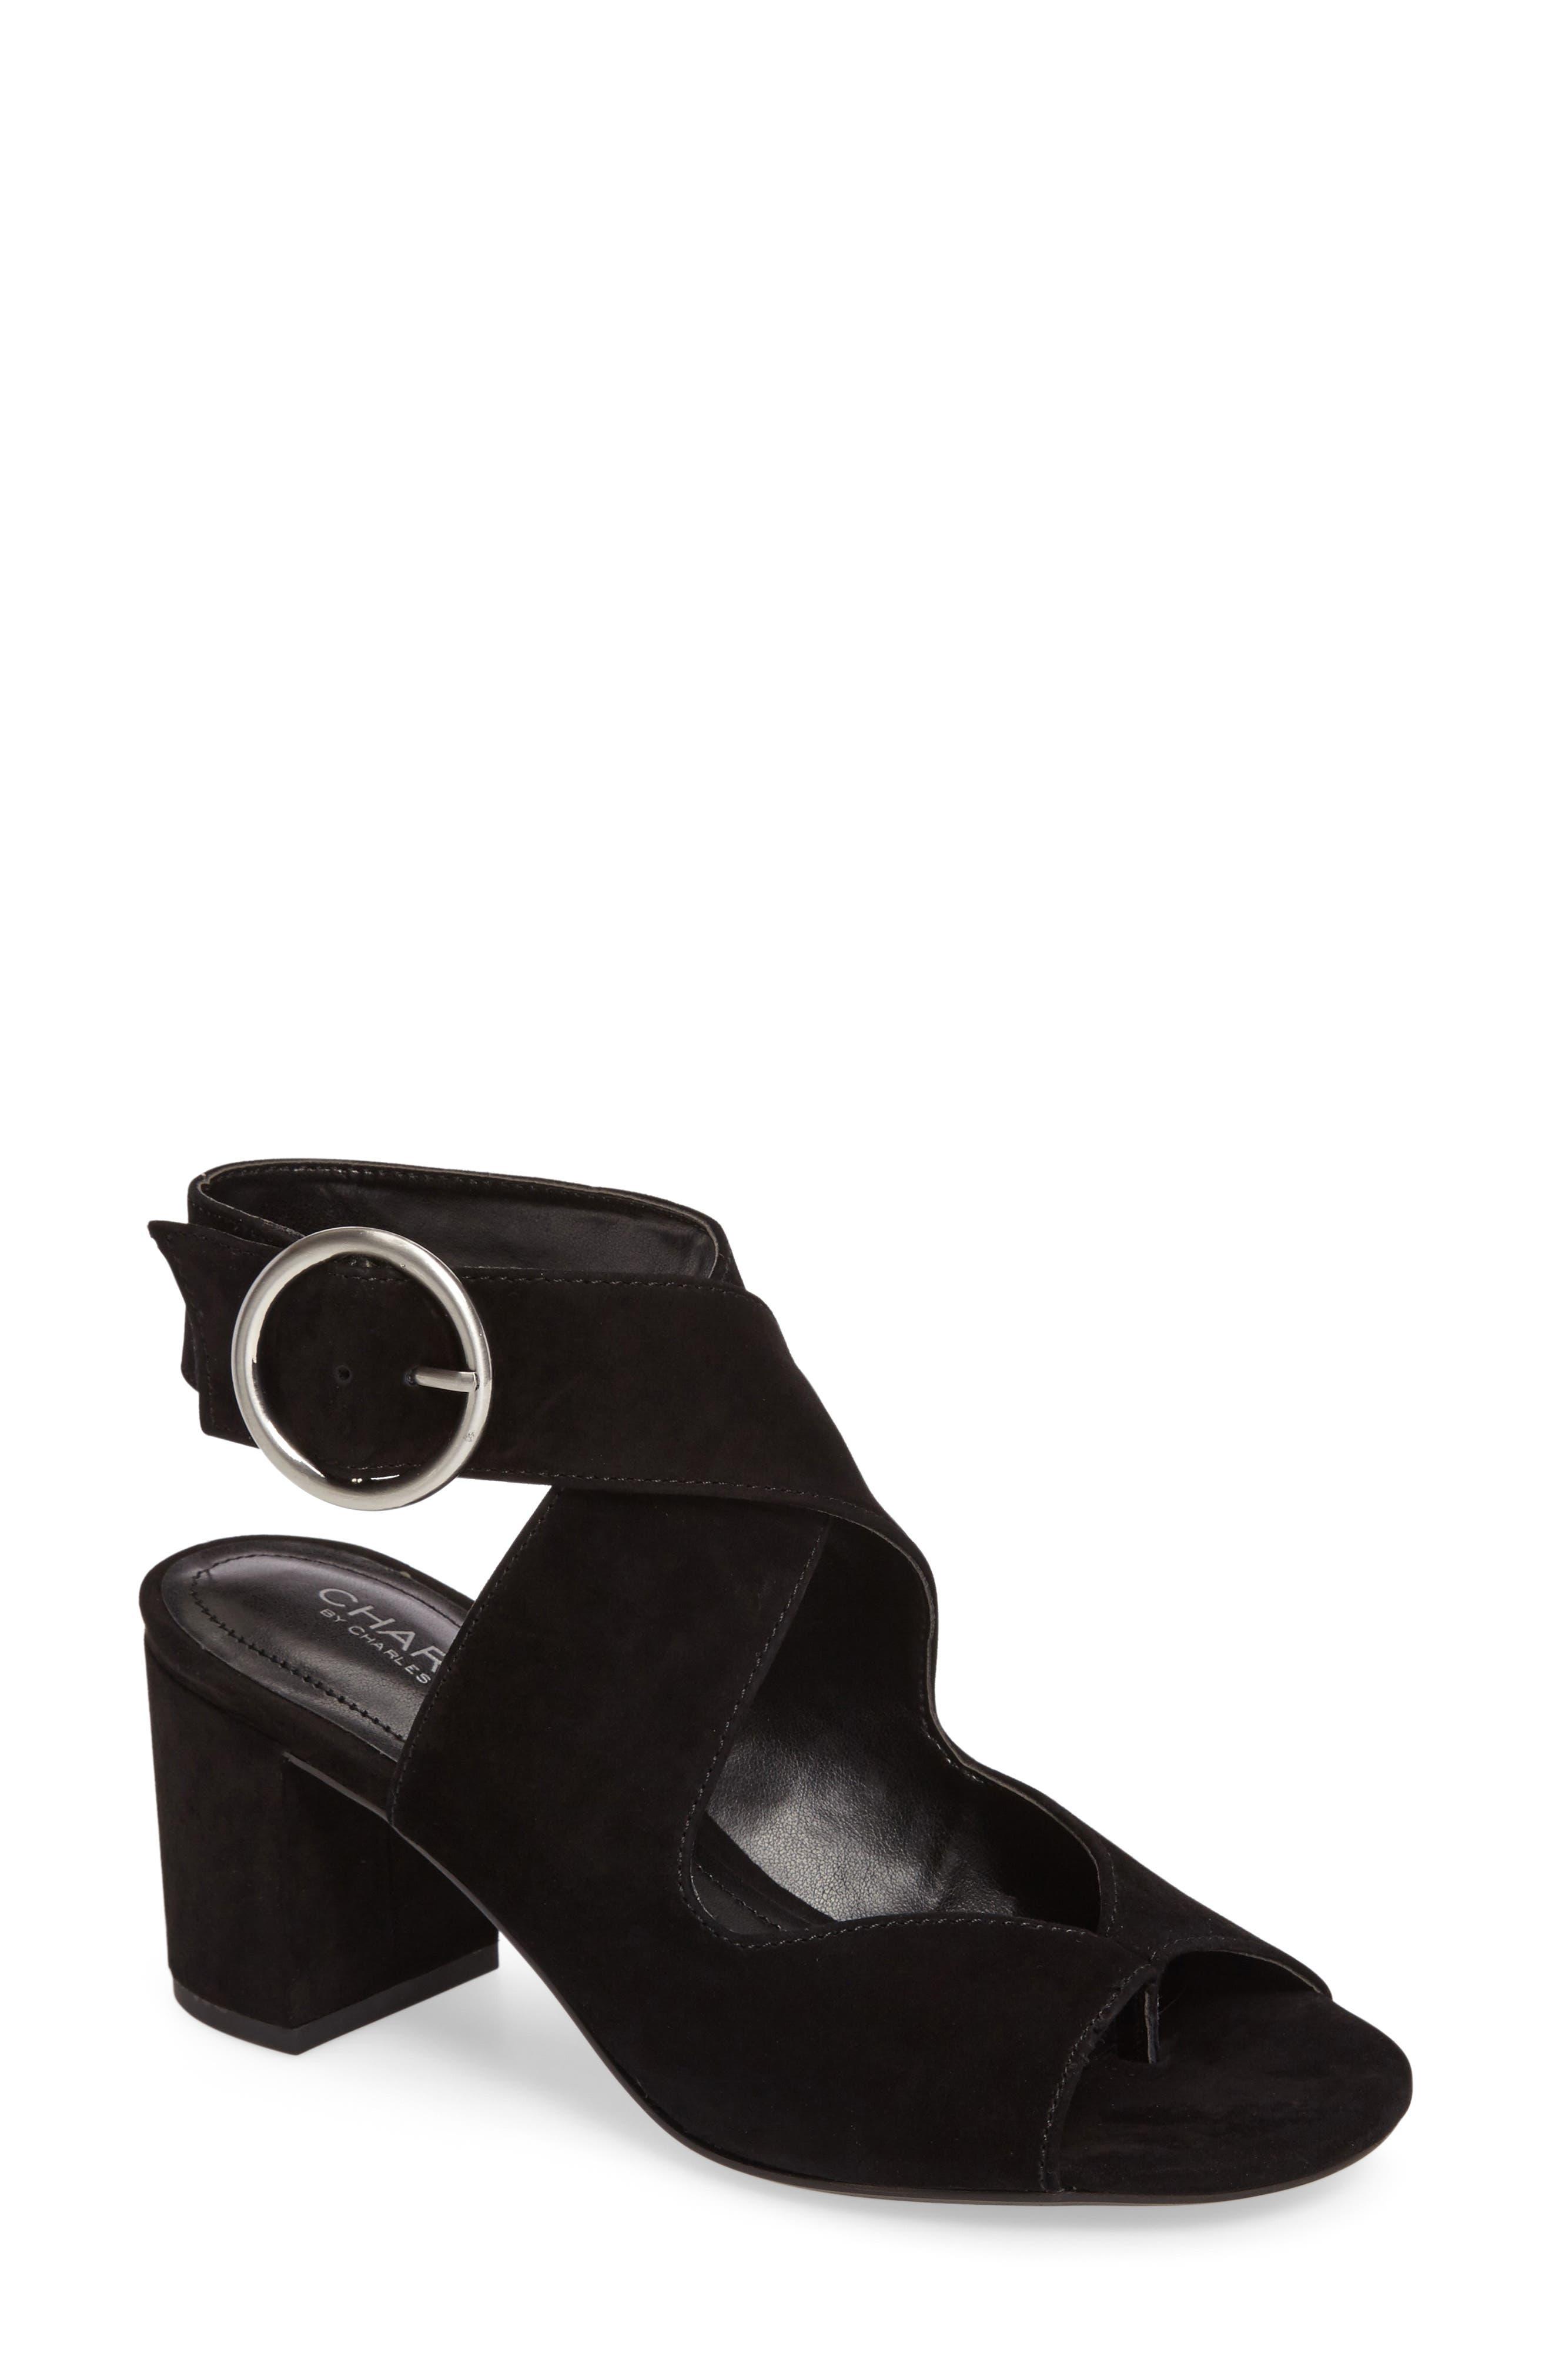 Charles by Charles David Shoes